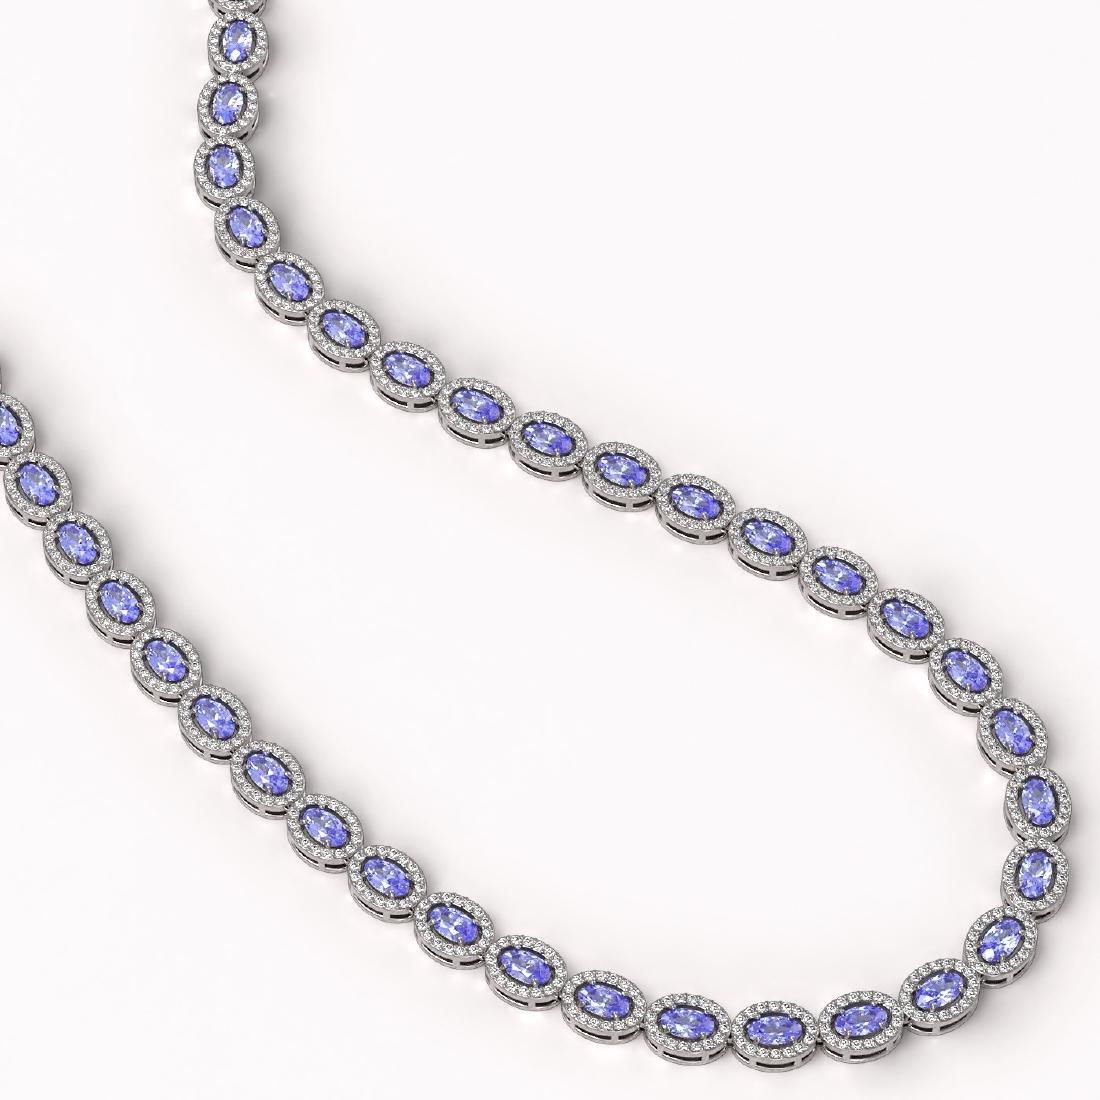 22.62 CTW Tanzanite & Diamond Halo Necklace 10K White - 2